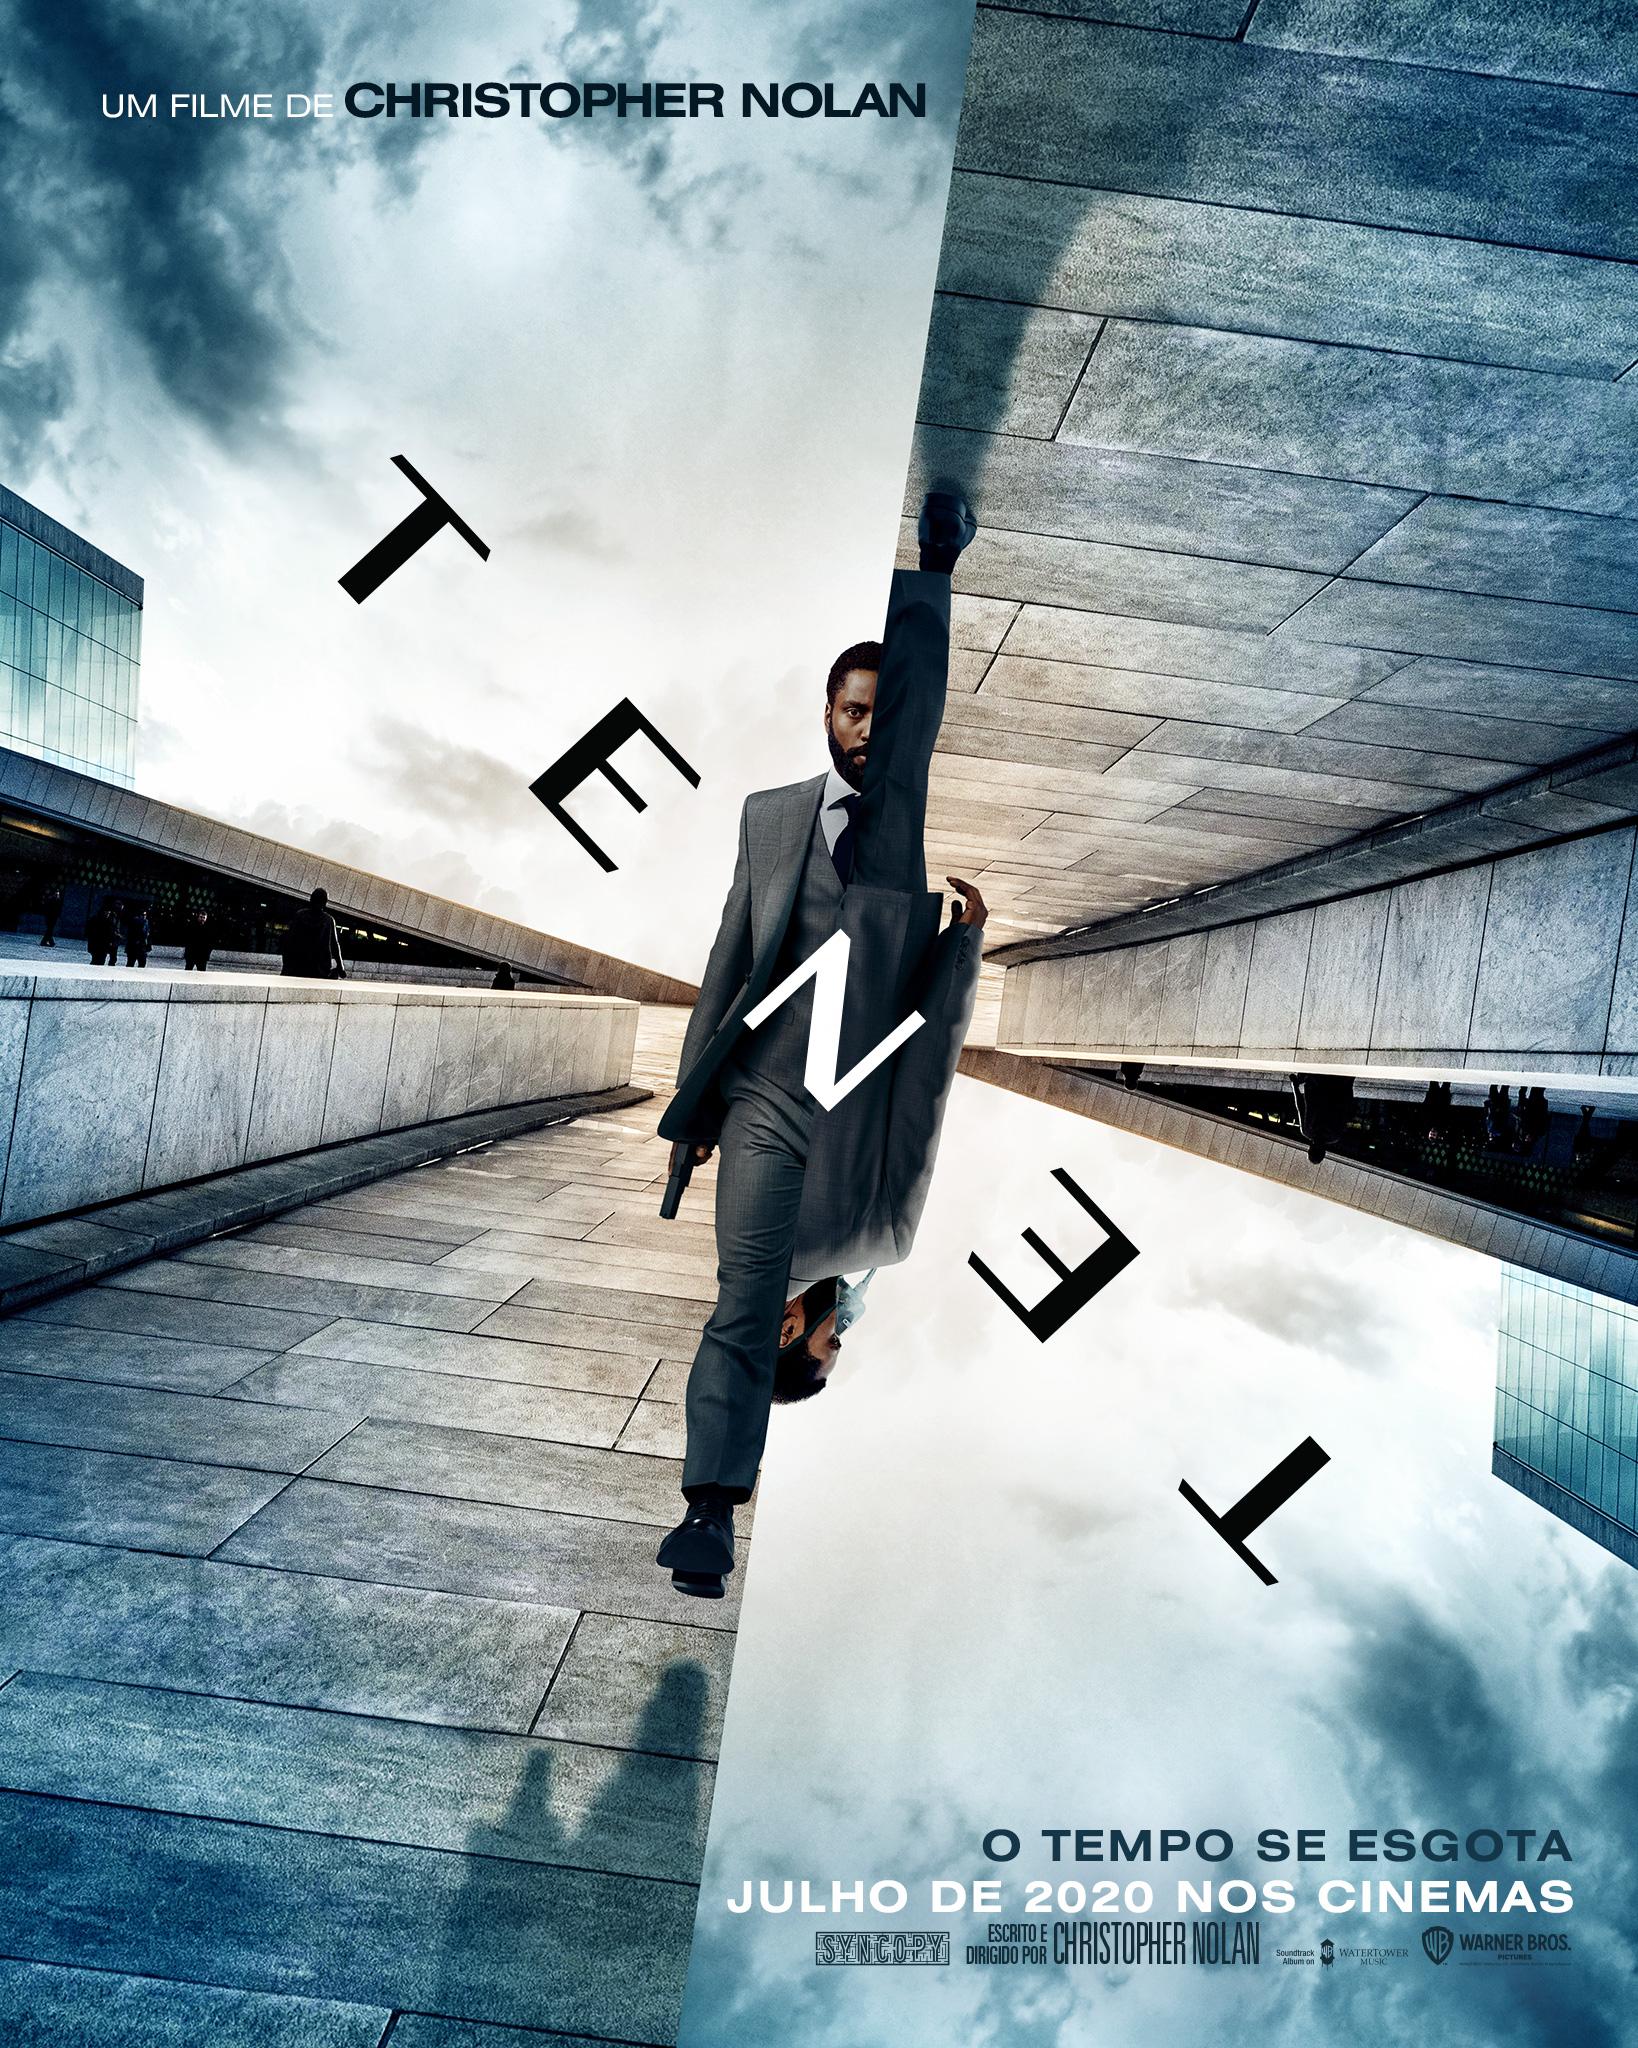 Tenet | Novo filme de Christopher Nolan ganha primeiro trailer e arte 1